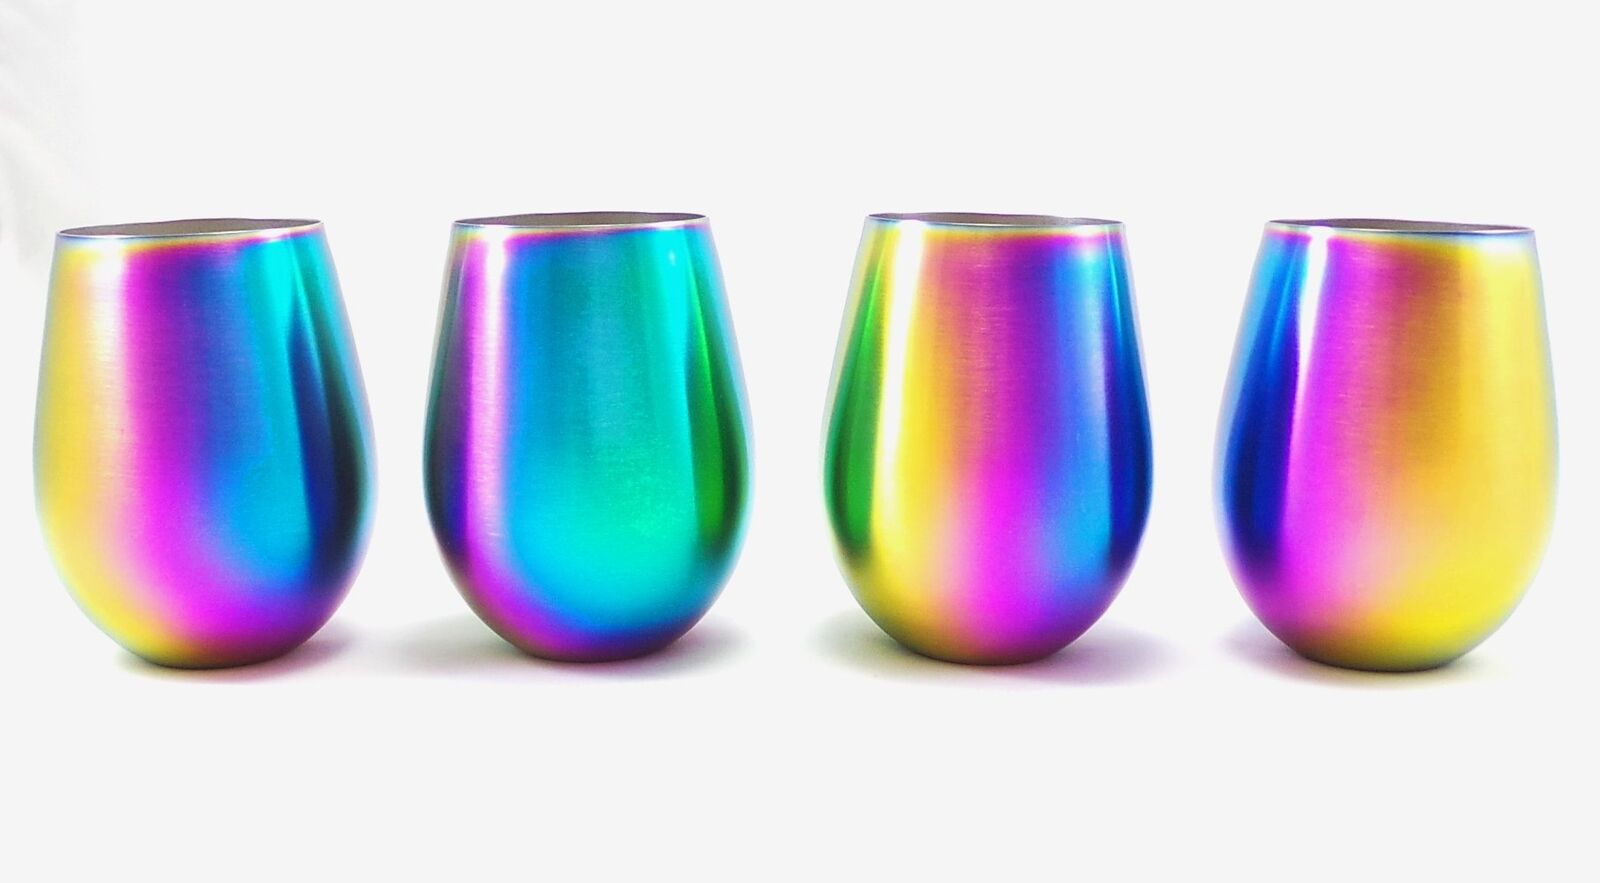 Shatterproof Stainless Steel Wine Glasses (Set of 4), Titanium Rainbow colord F